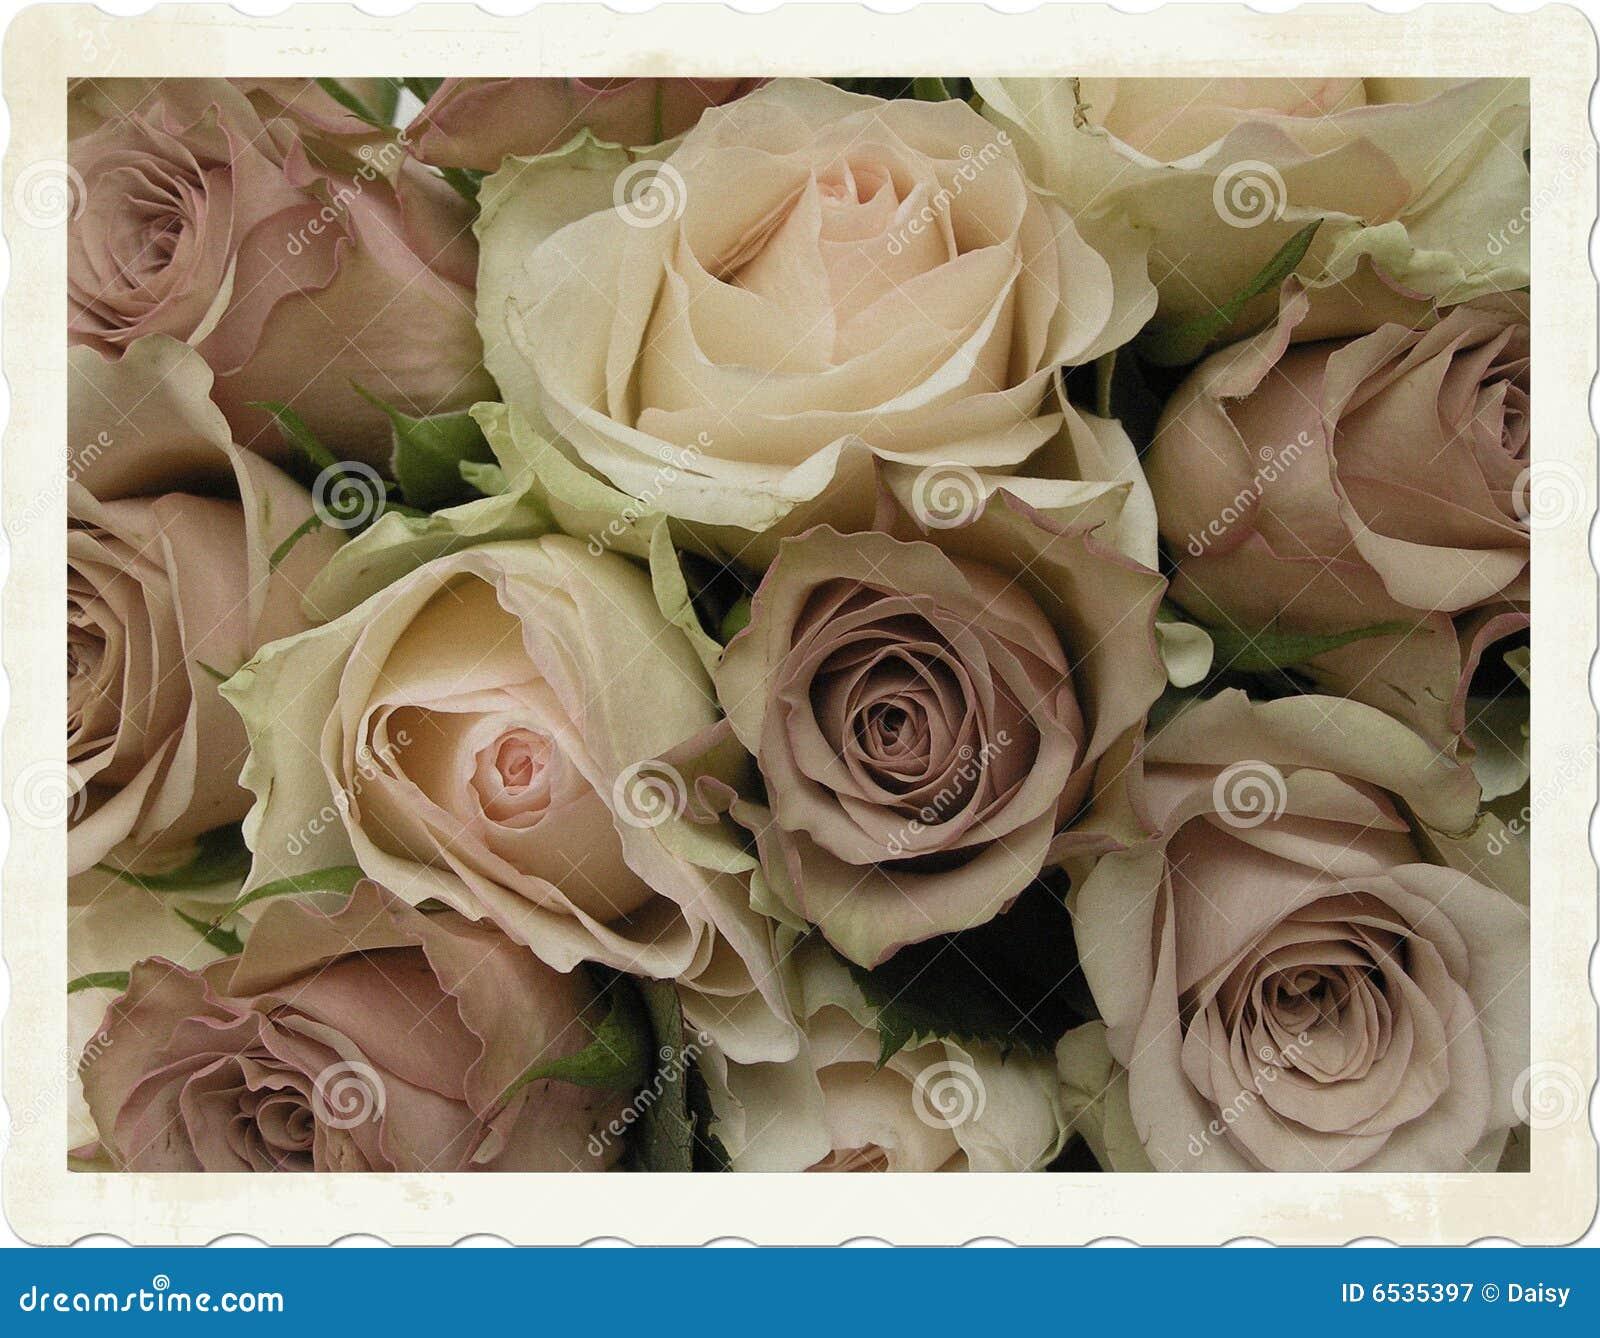 Vintage Wedding Bouquet Stock Image. Image Of Color